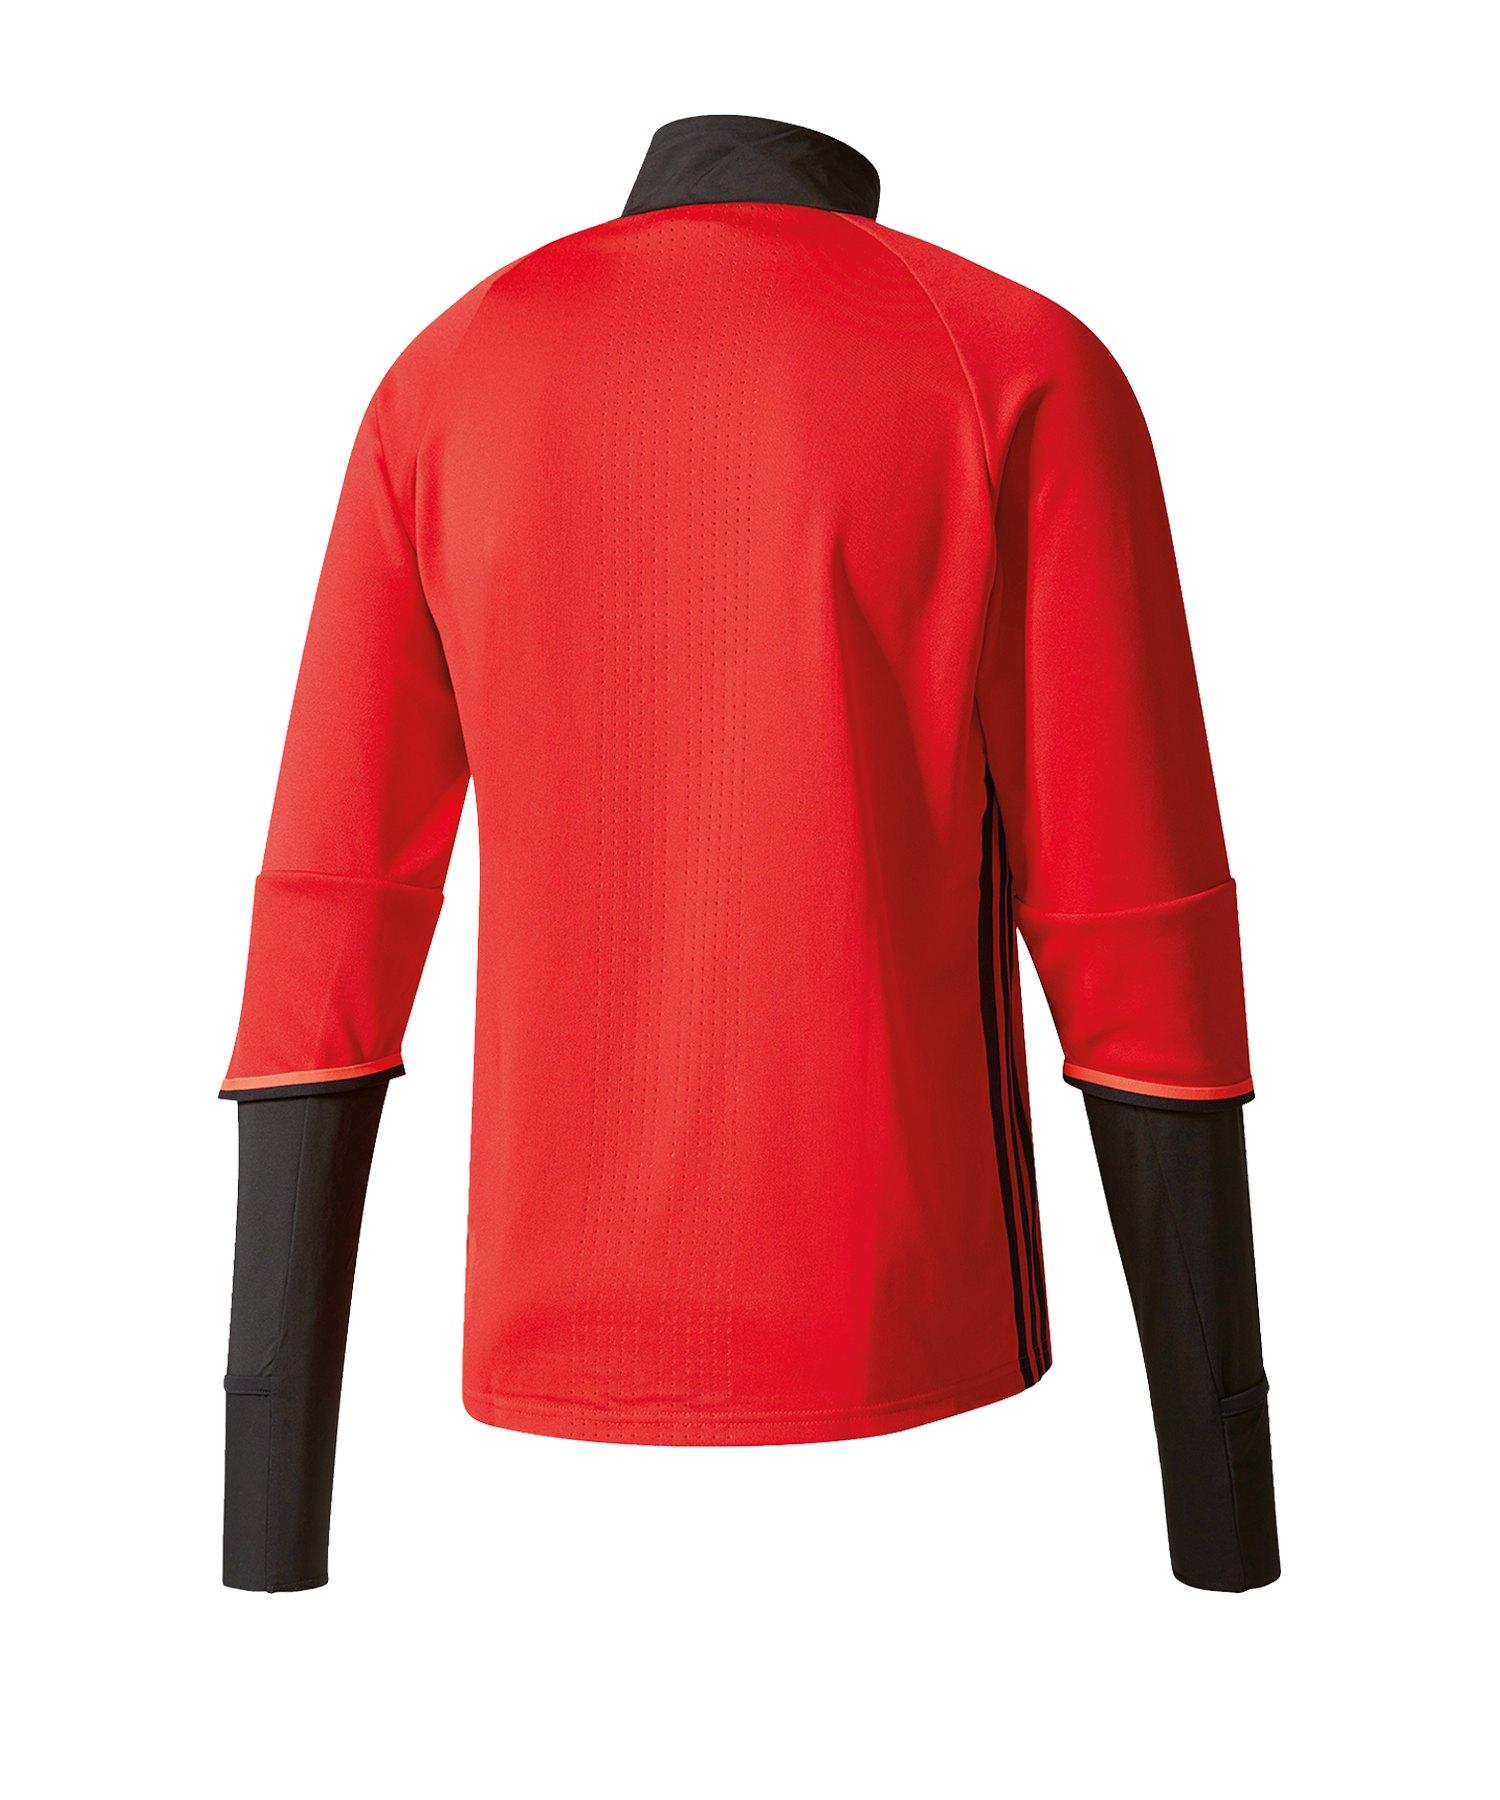 adidas Condivo 16 Training Top Rot Schwarz - rot